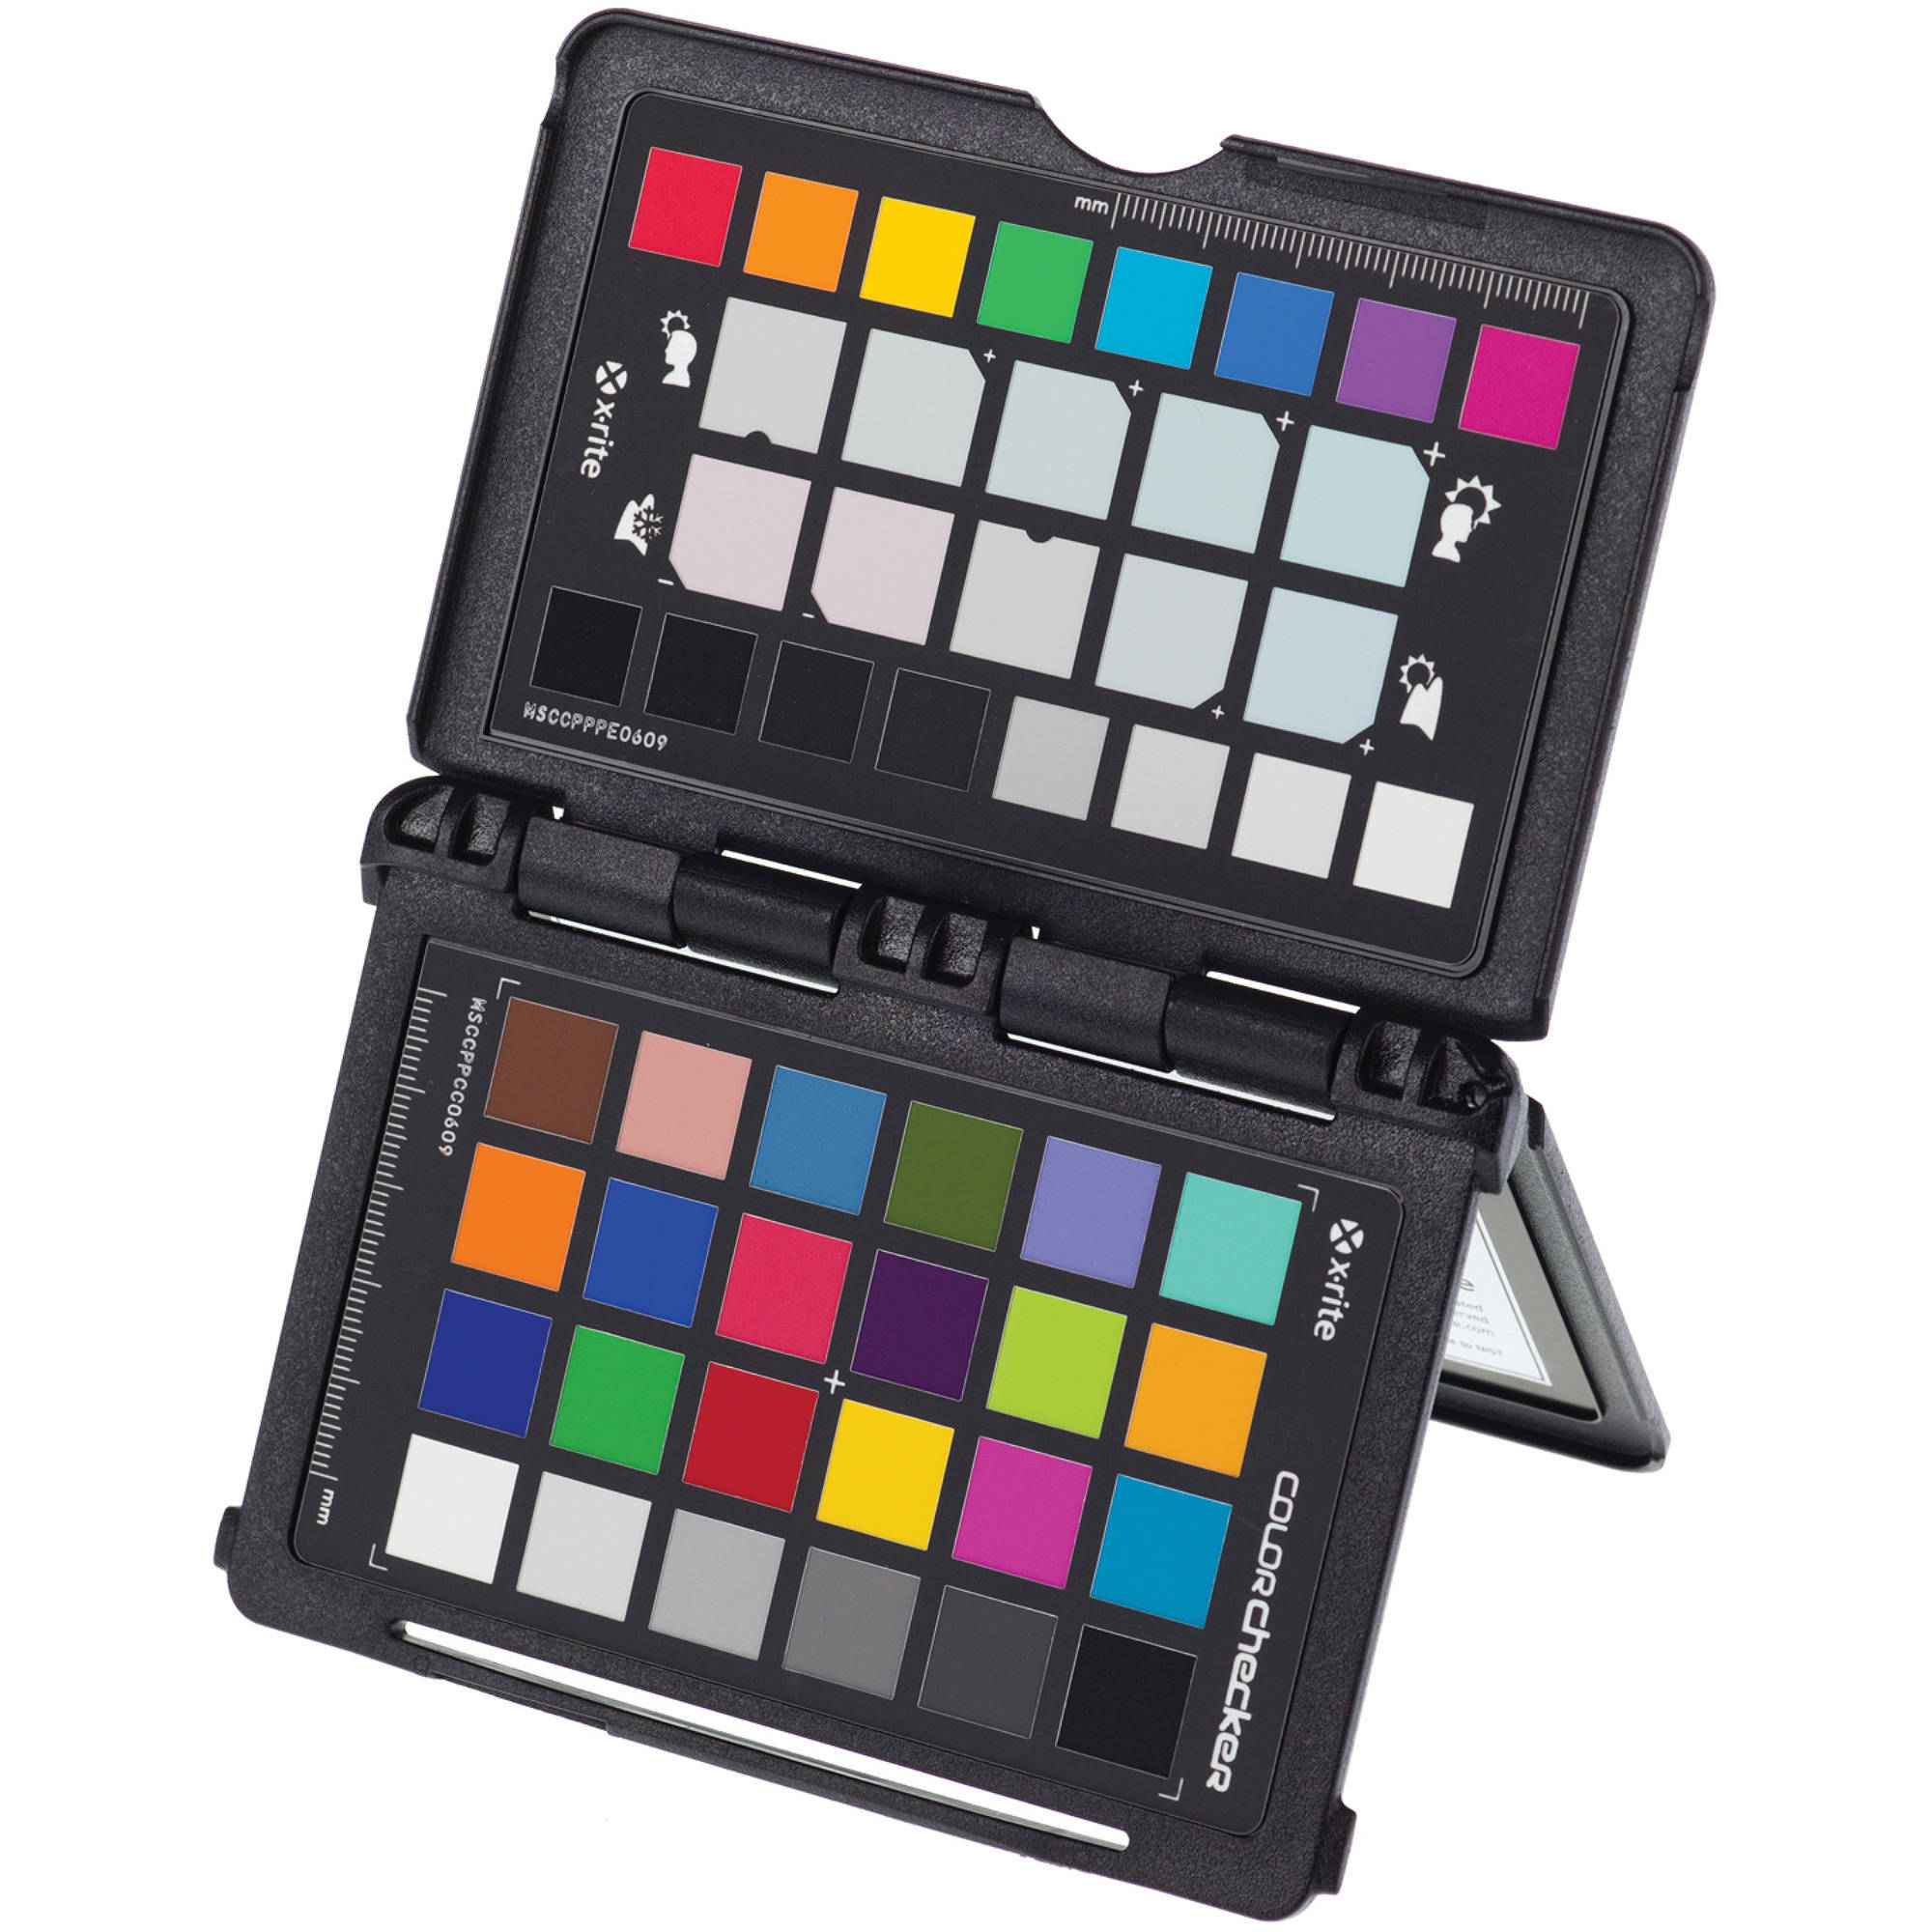 X-Rite i1Display Pro and ColorChecker Passport Bundle